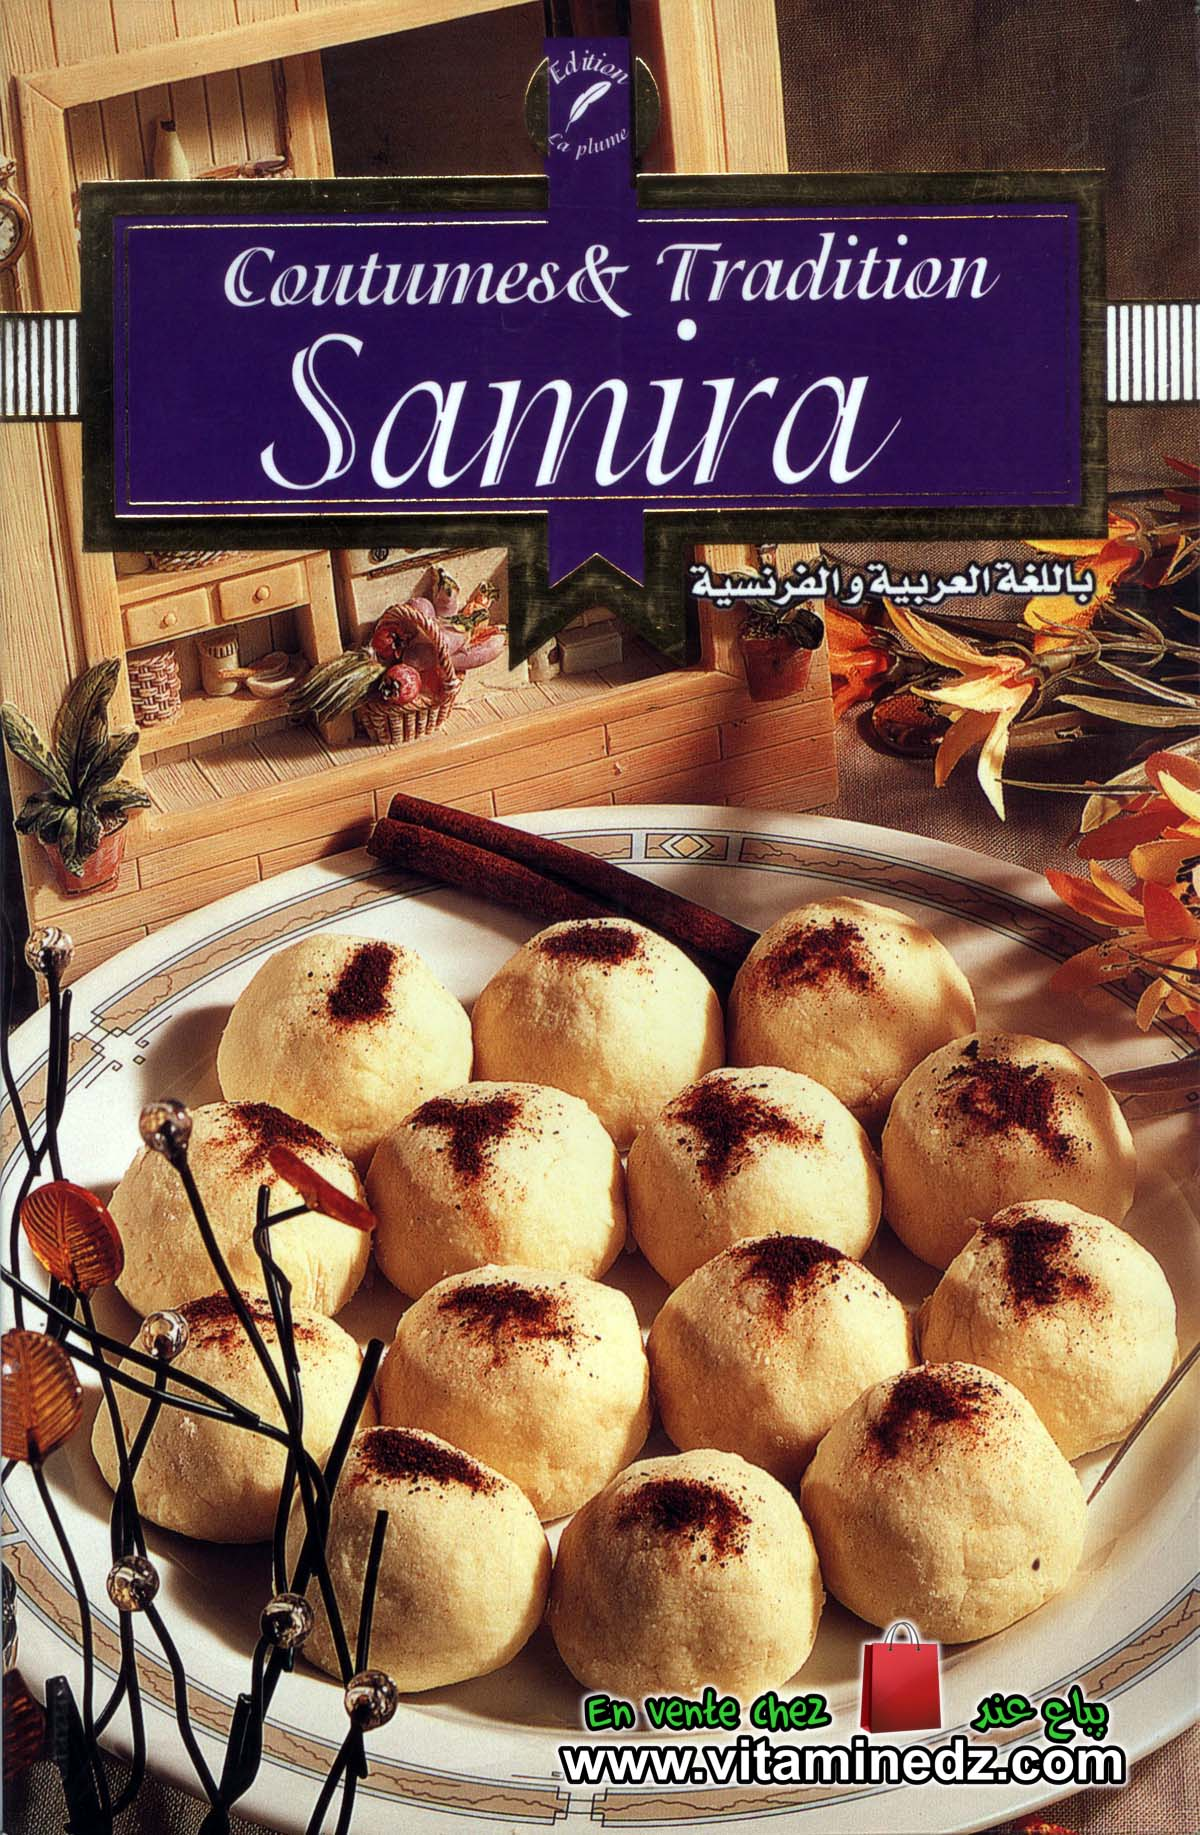 samira recettes de cuisine livres cuisine. Black Bedroom Furniture Sets. Home Design Ideas